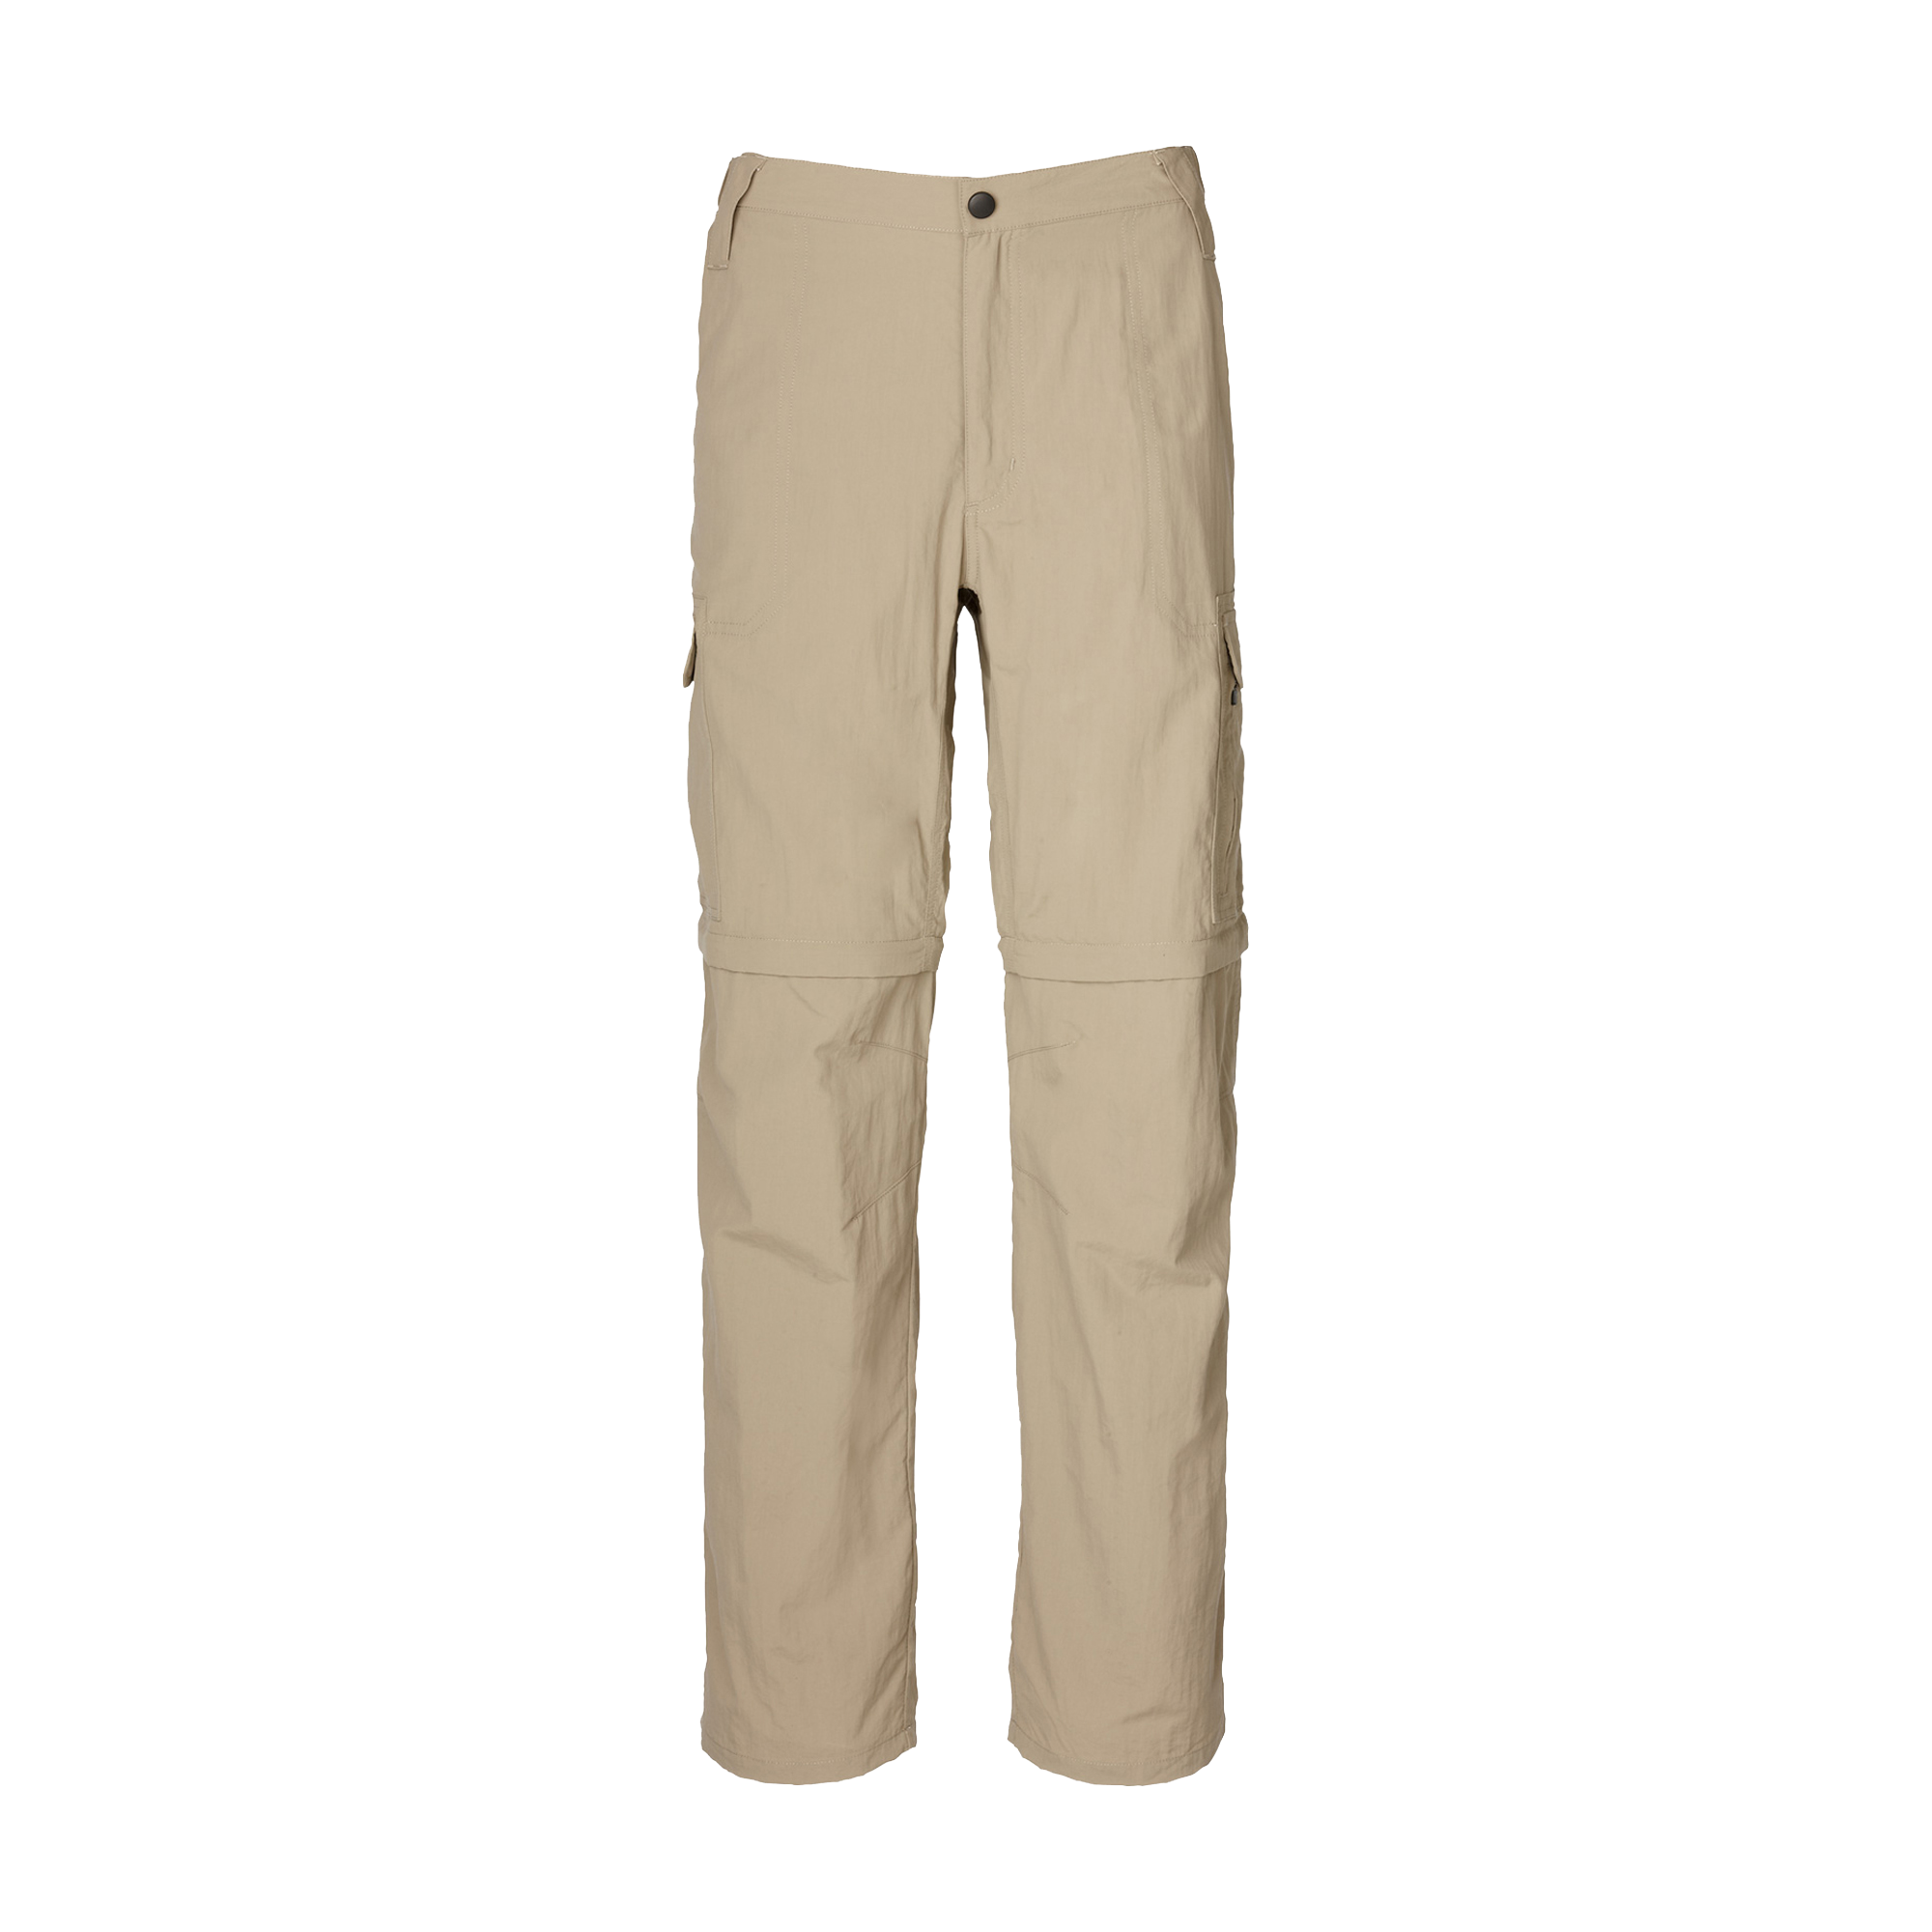 Khaki Pants PNG - 43420